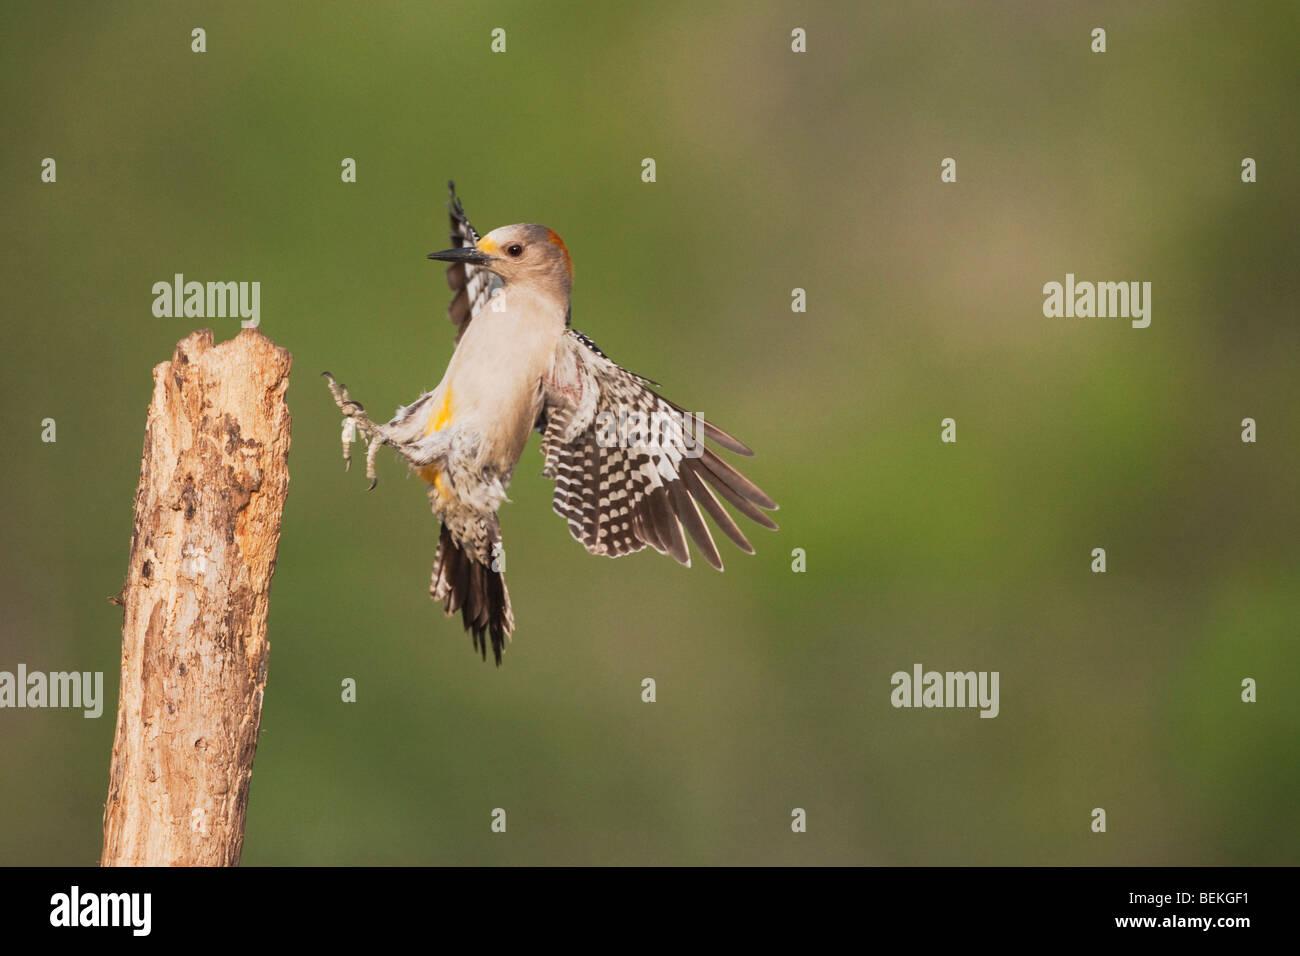 Golden-fronted Woodpecker (Melanerpes aurifrons), female landing, Sinton, Corpus Christi, Coastal Bend, Texas, USA - Stock Image